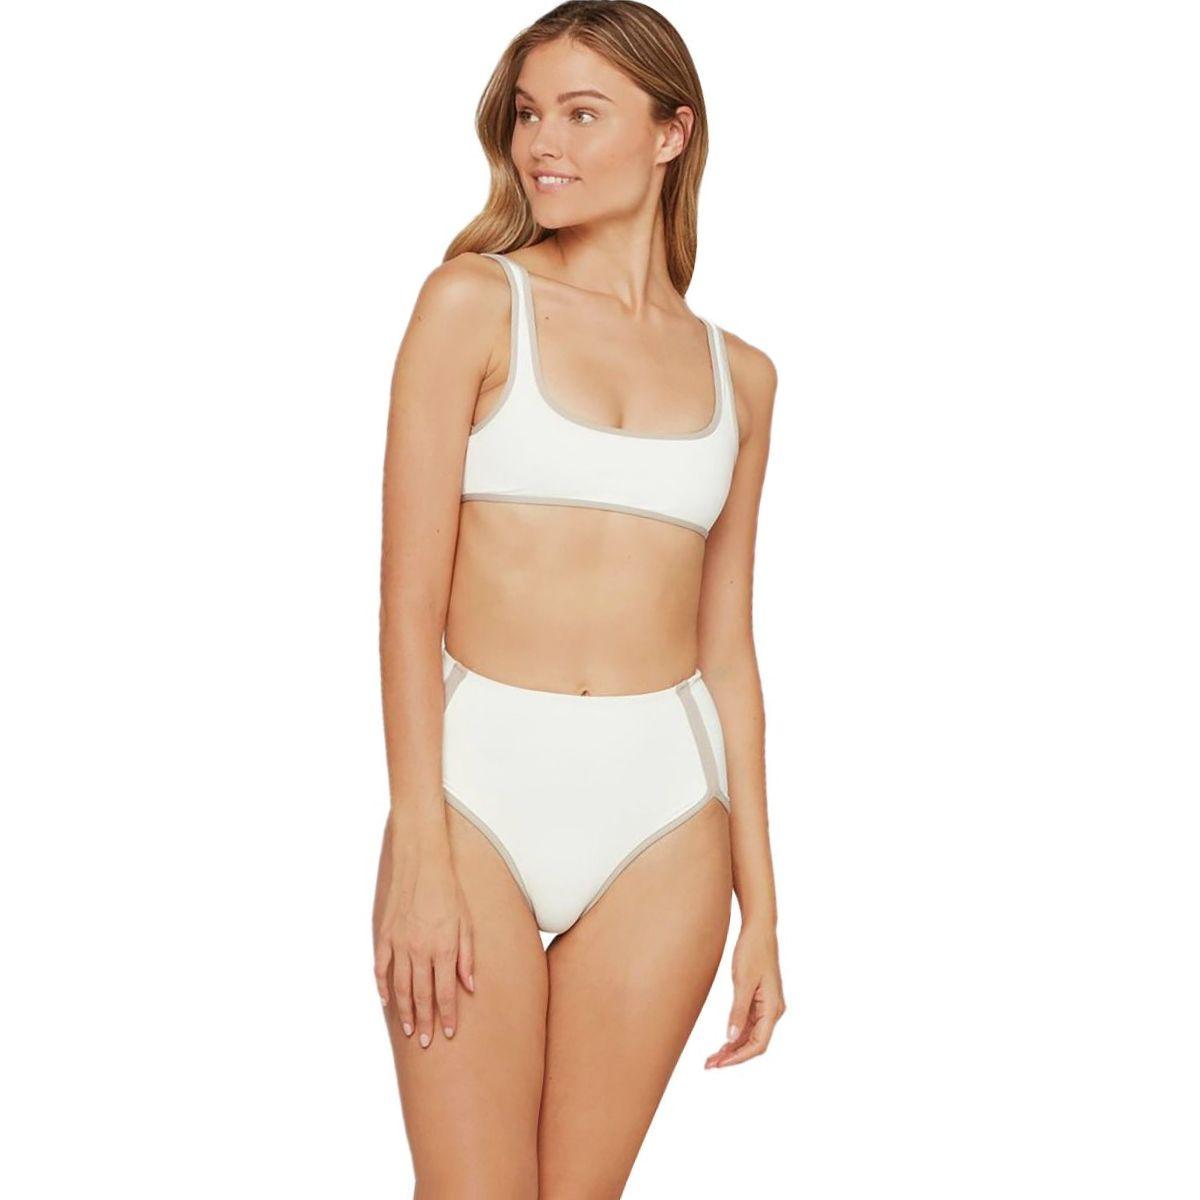 L Space Mickee Color Block Bikini Top - Women's